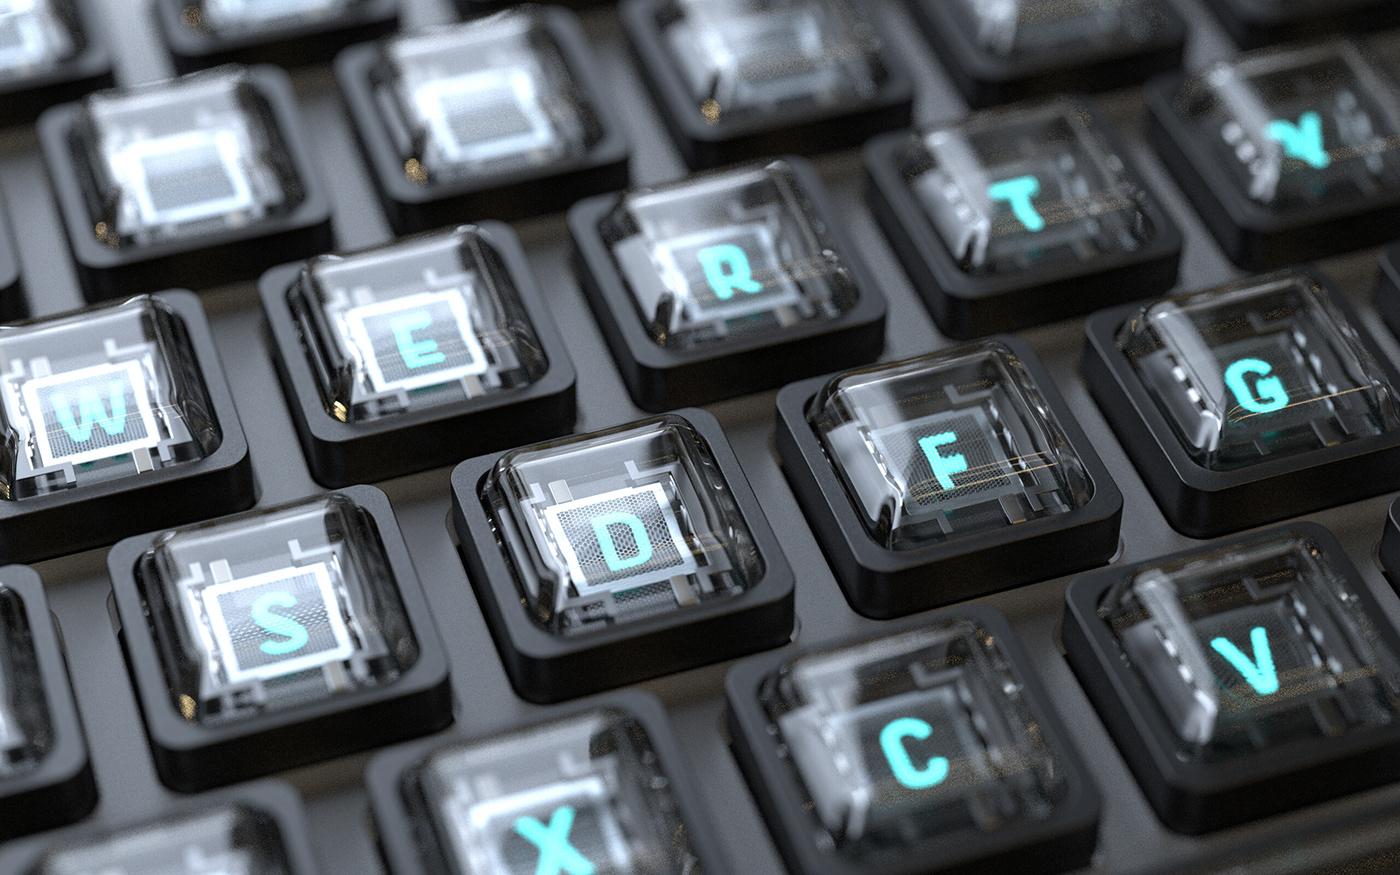 VFD Keyboard 2 by Richard Falcema